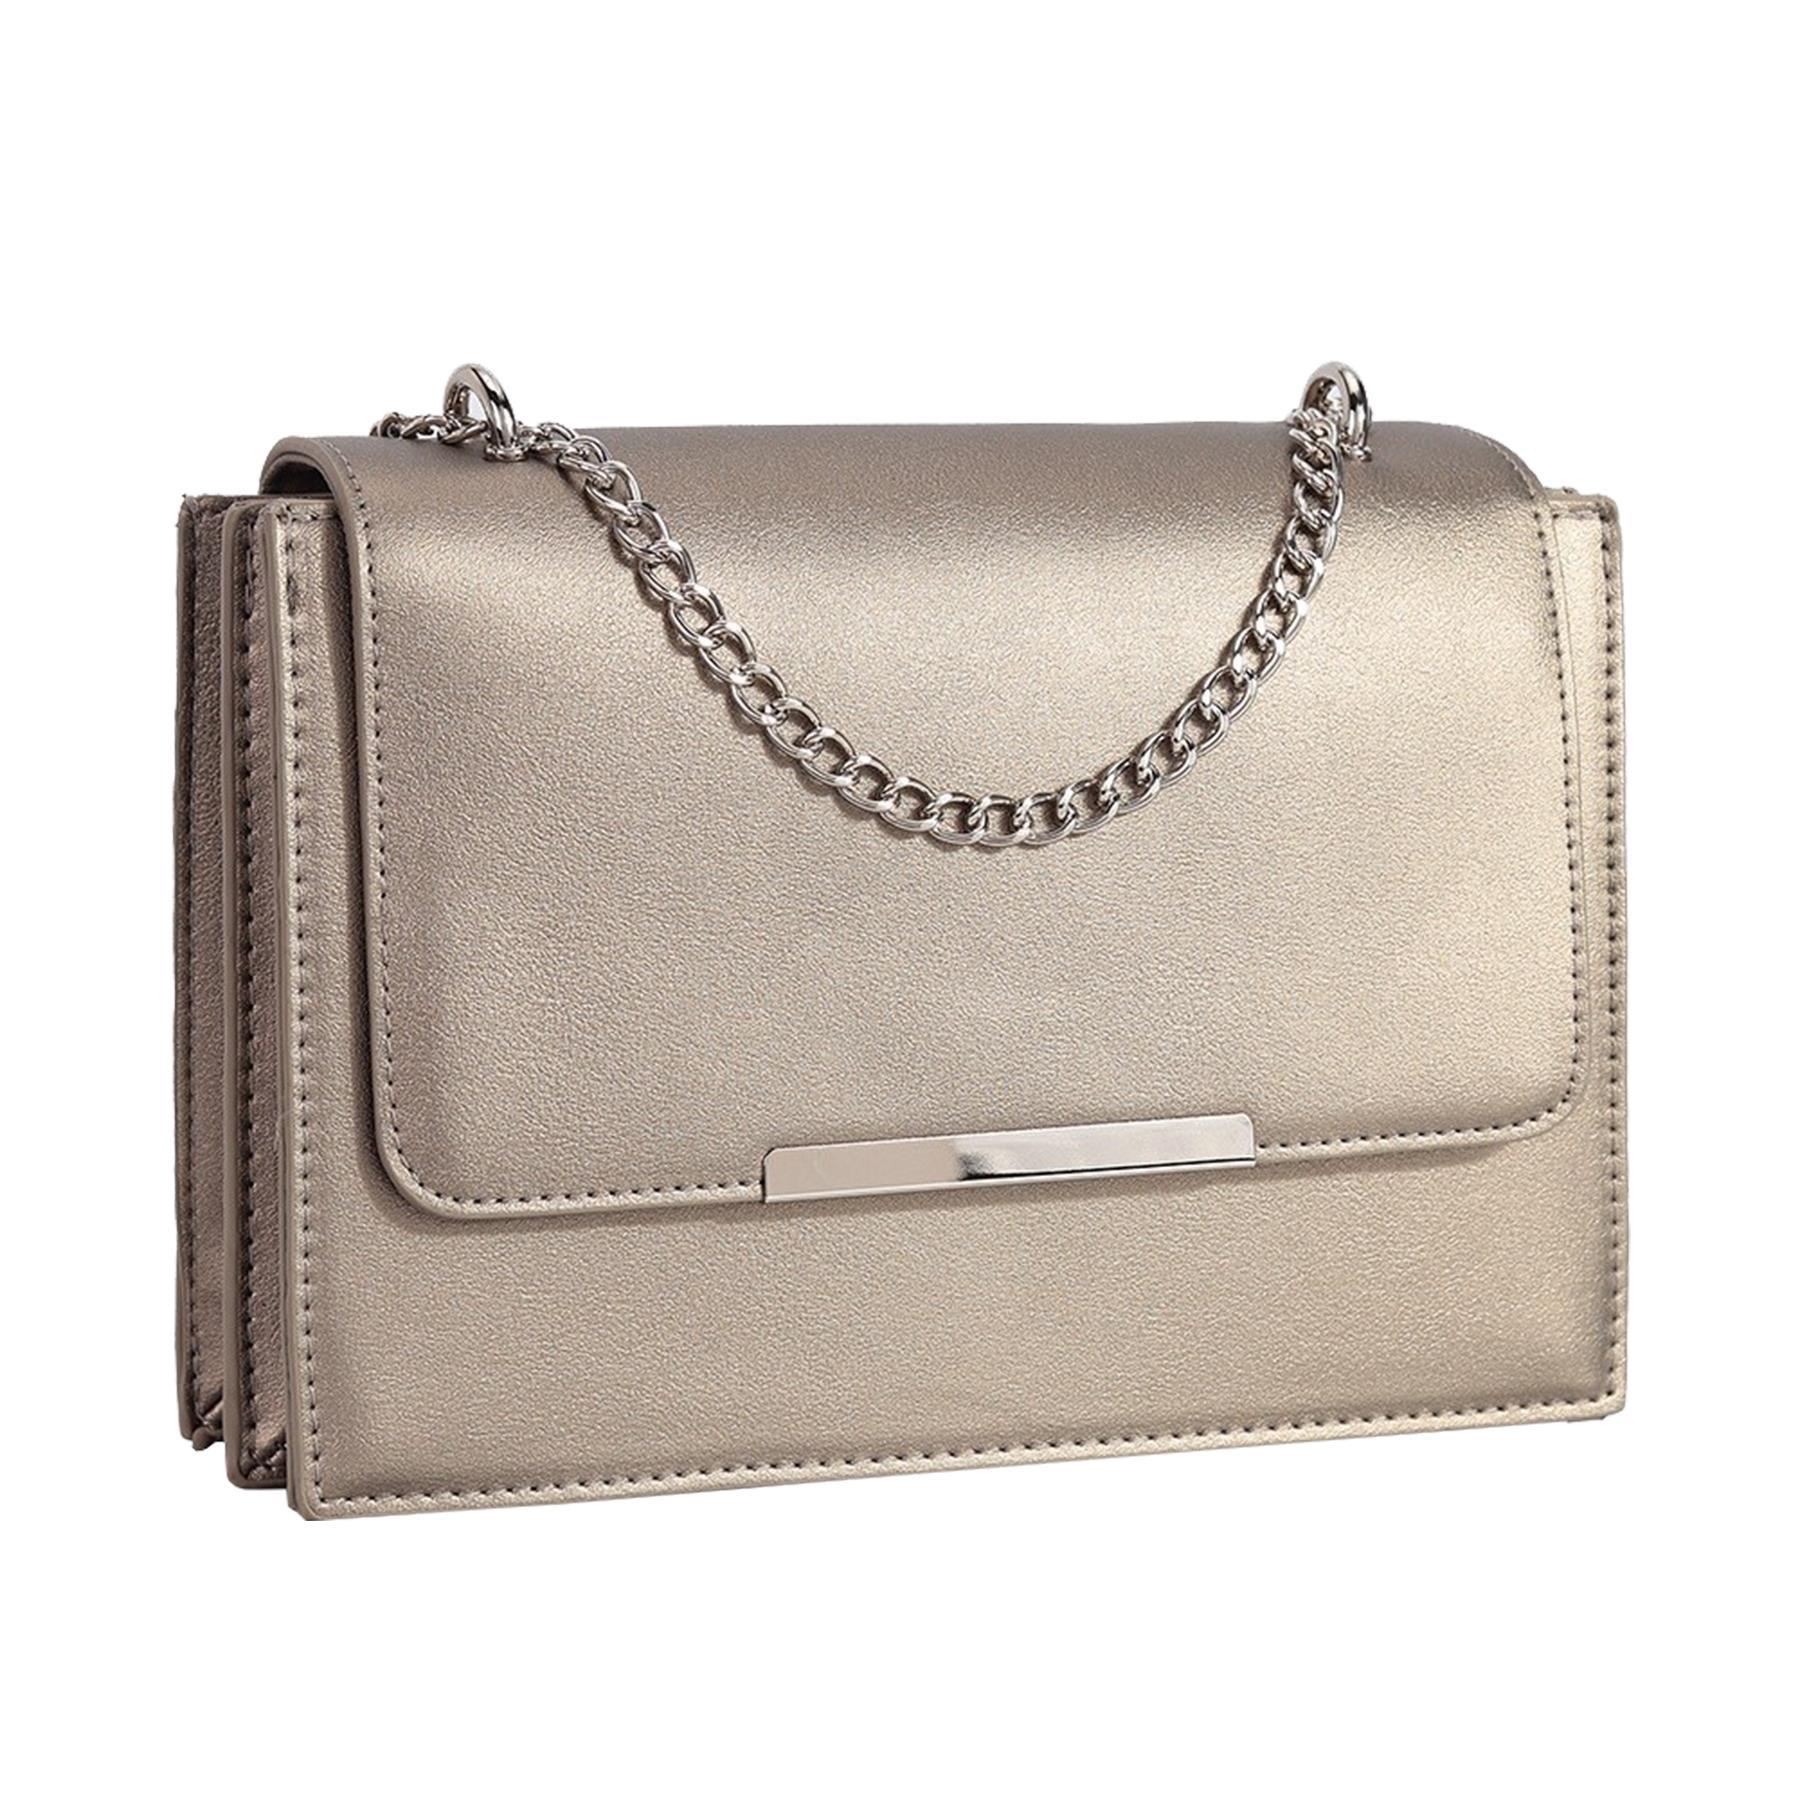 New-Women-s-Faux-Leather-Elegant-Stylish-Fashion-Shoulder-Clutch-Bag thumbnail 12